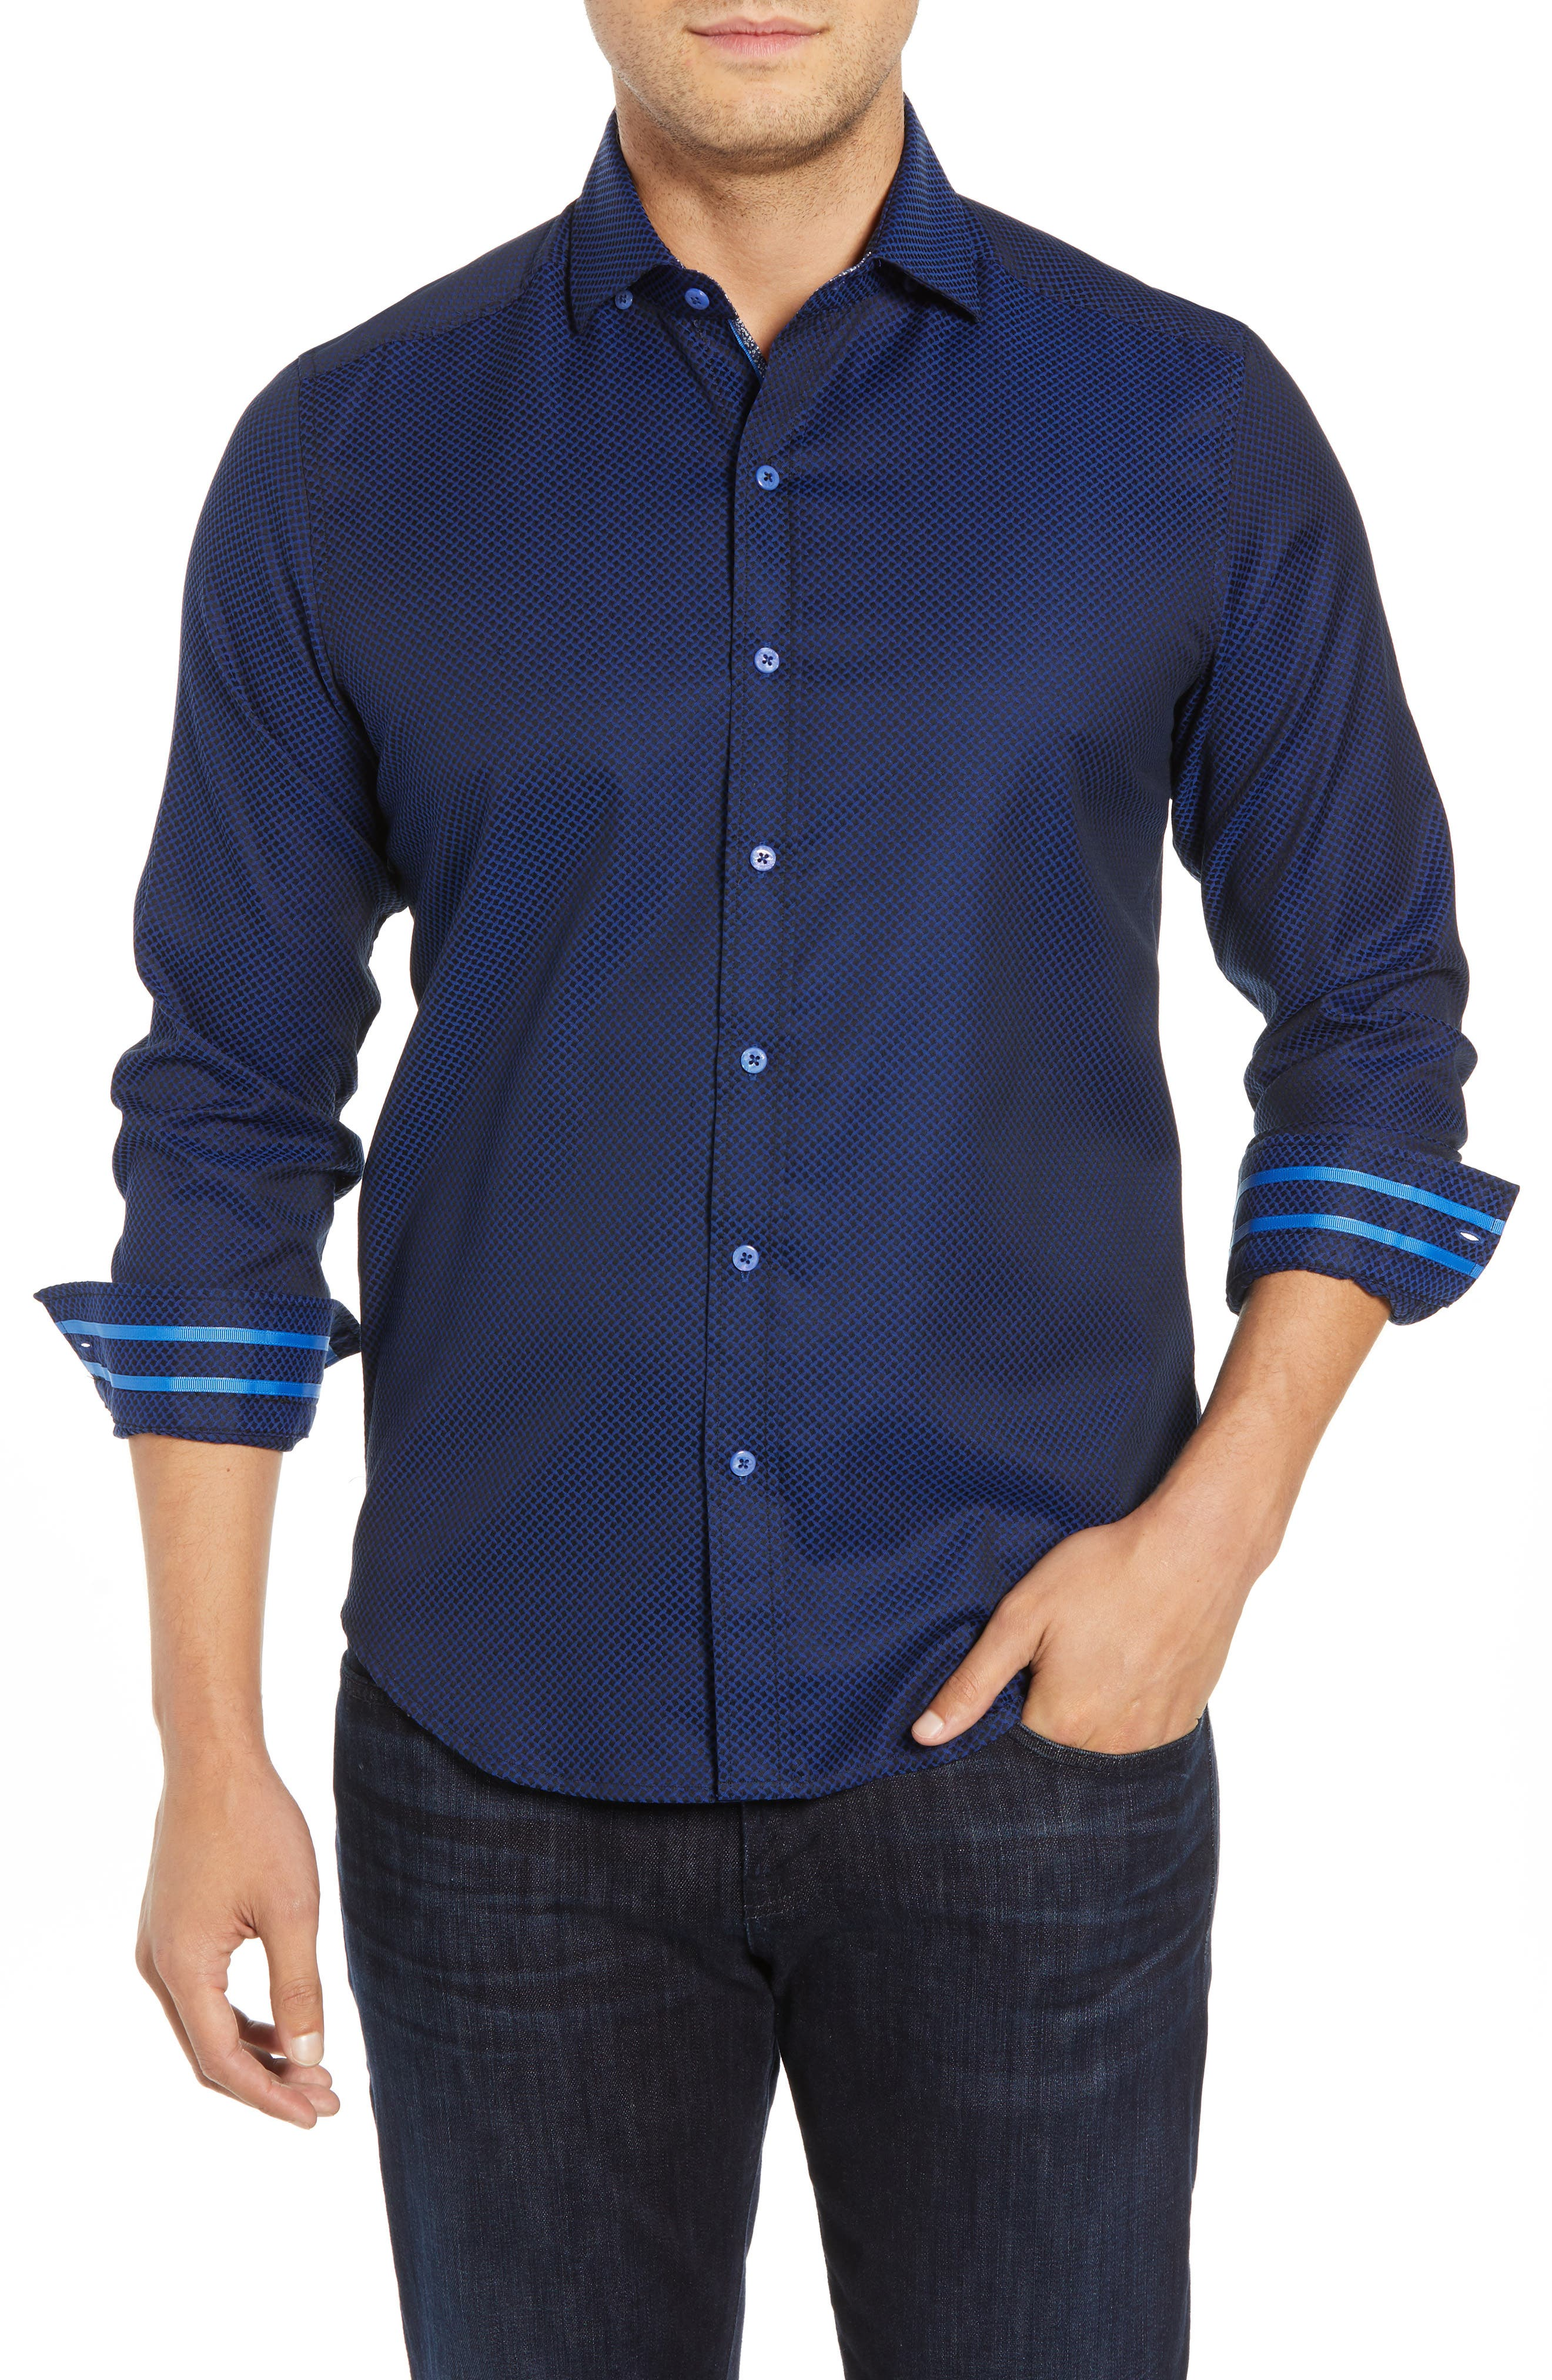 Anson Tailored Fit Jacquard Sport Shirt,                             Main thumbnail 1, color,                             NAVY